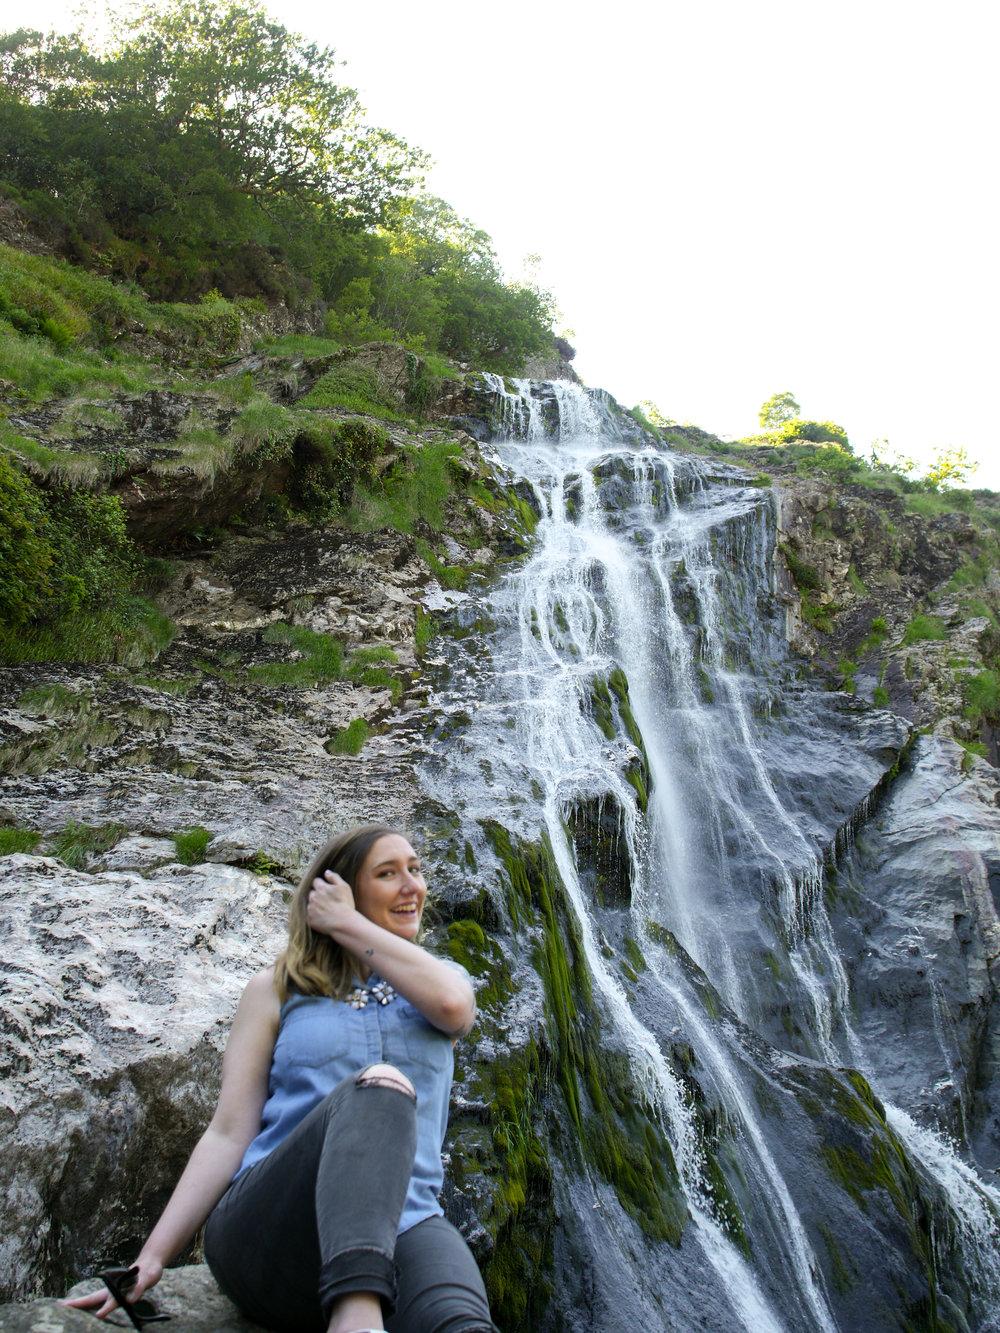 Candid Alexandra at Powercourt Waterfall in Wicklow, Ireland